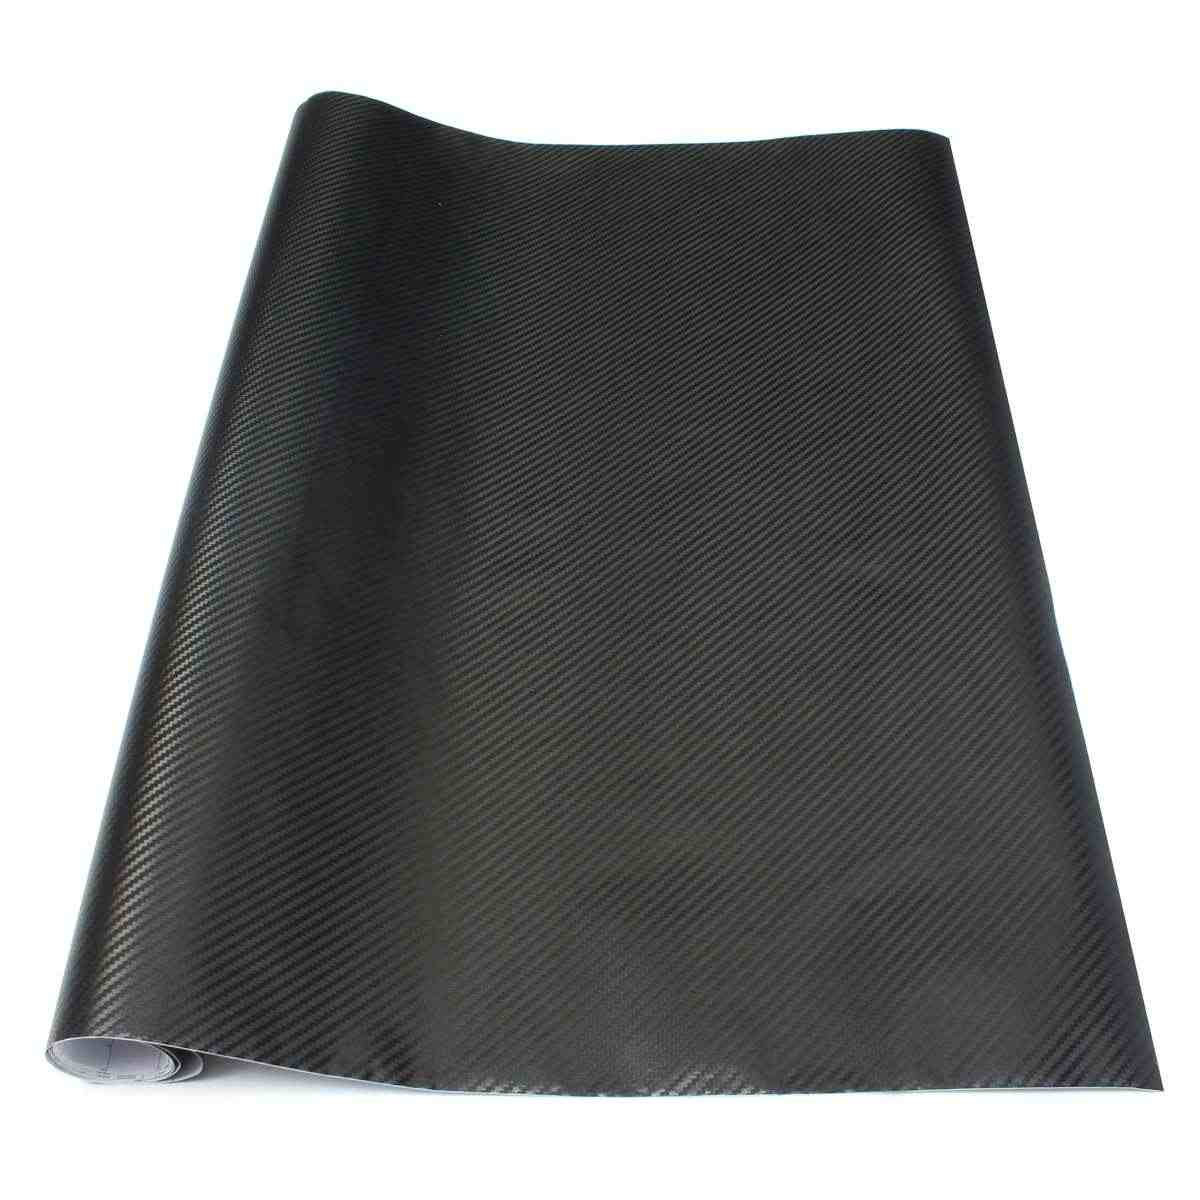 250 x 65cm Universal Black 3D Carbon Fiber Vinyl Car Motorcycle Wrap Sheet Roll Film Sticker Foil Decal Car Styling Accessories